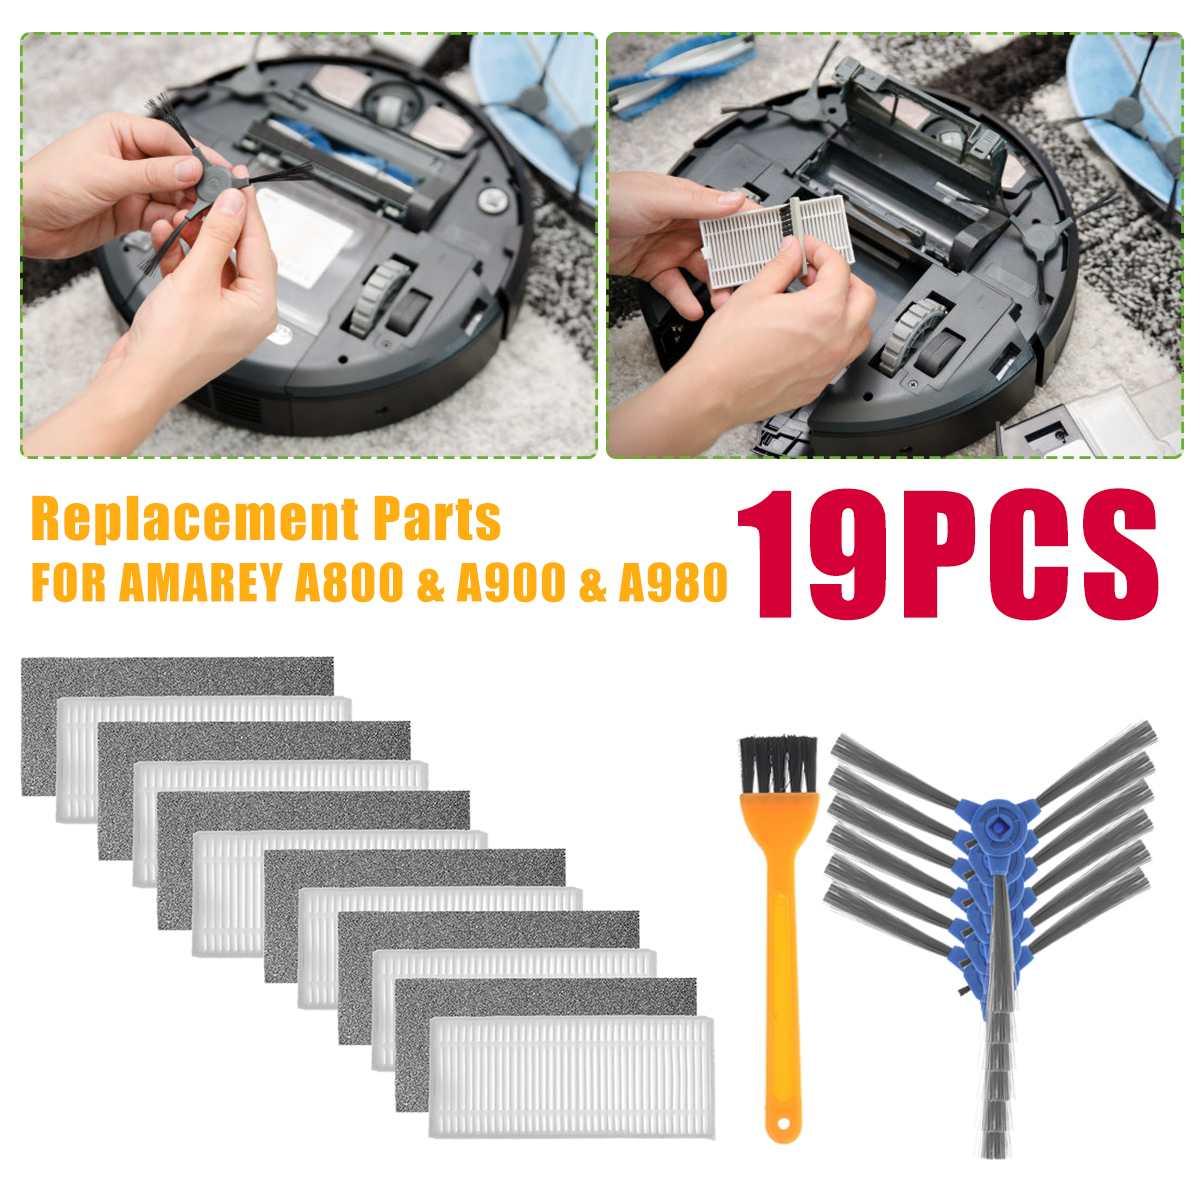 19Pcs/set Original Robot Vacuum Accessories Of Filter Main Brush Side Brush For Amarey A800 A900 A980 Roborock Vacuum Cleaner